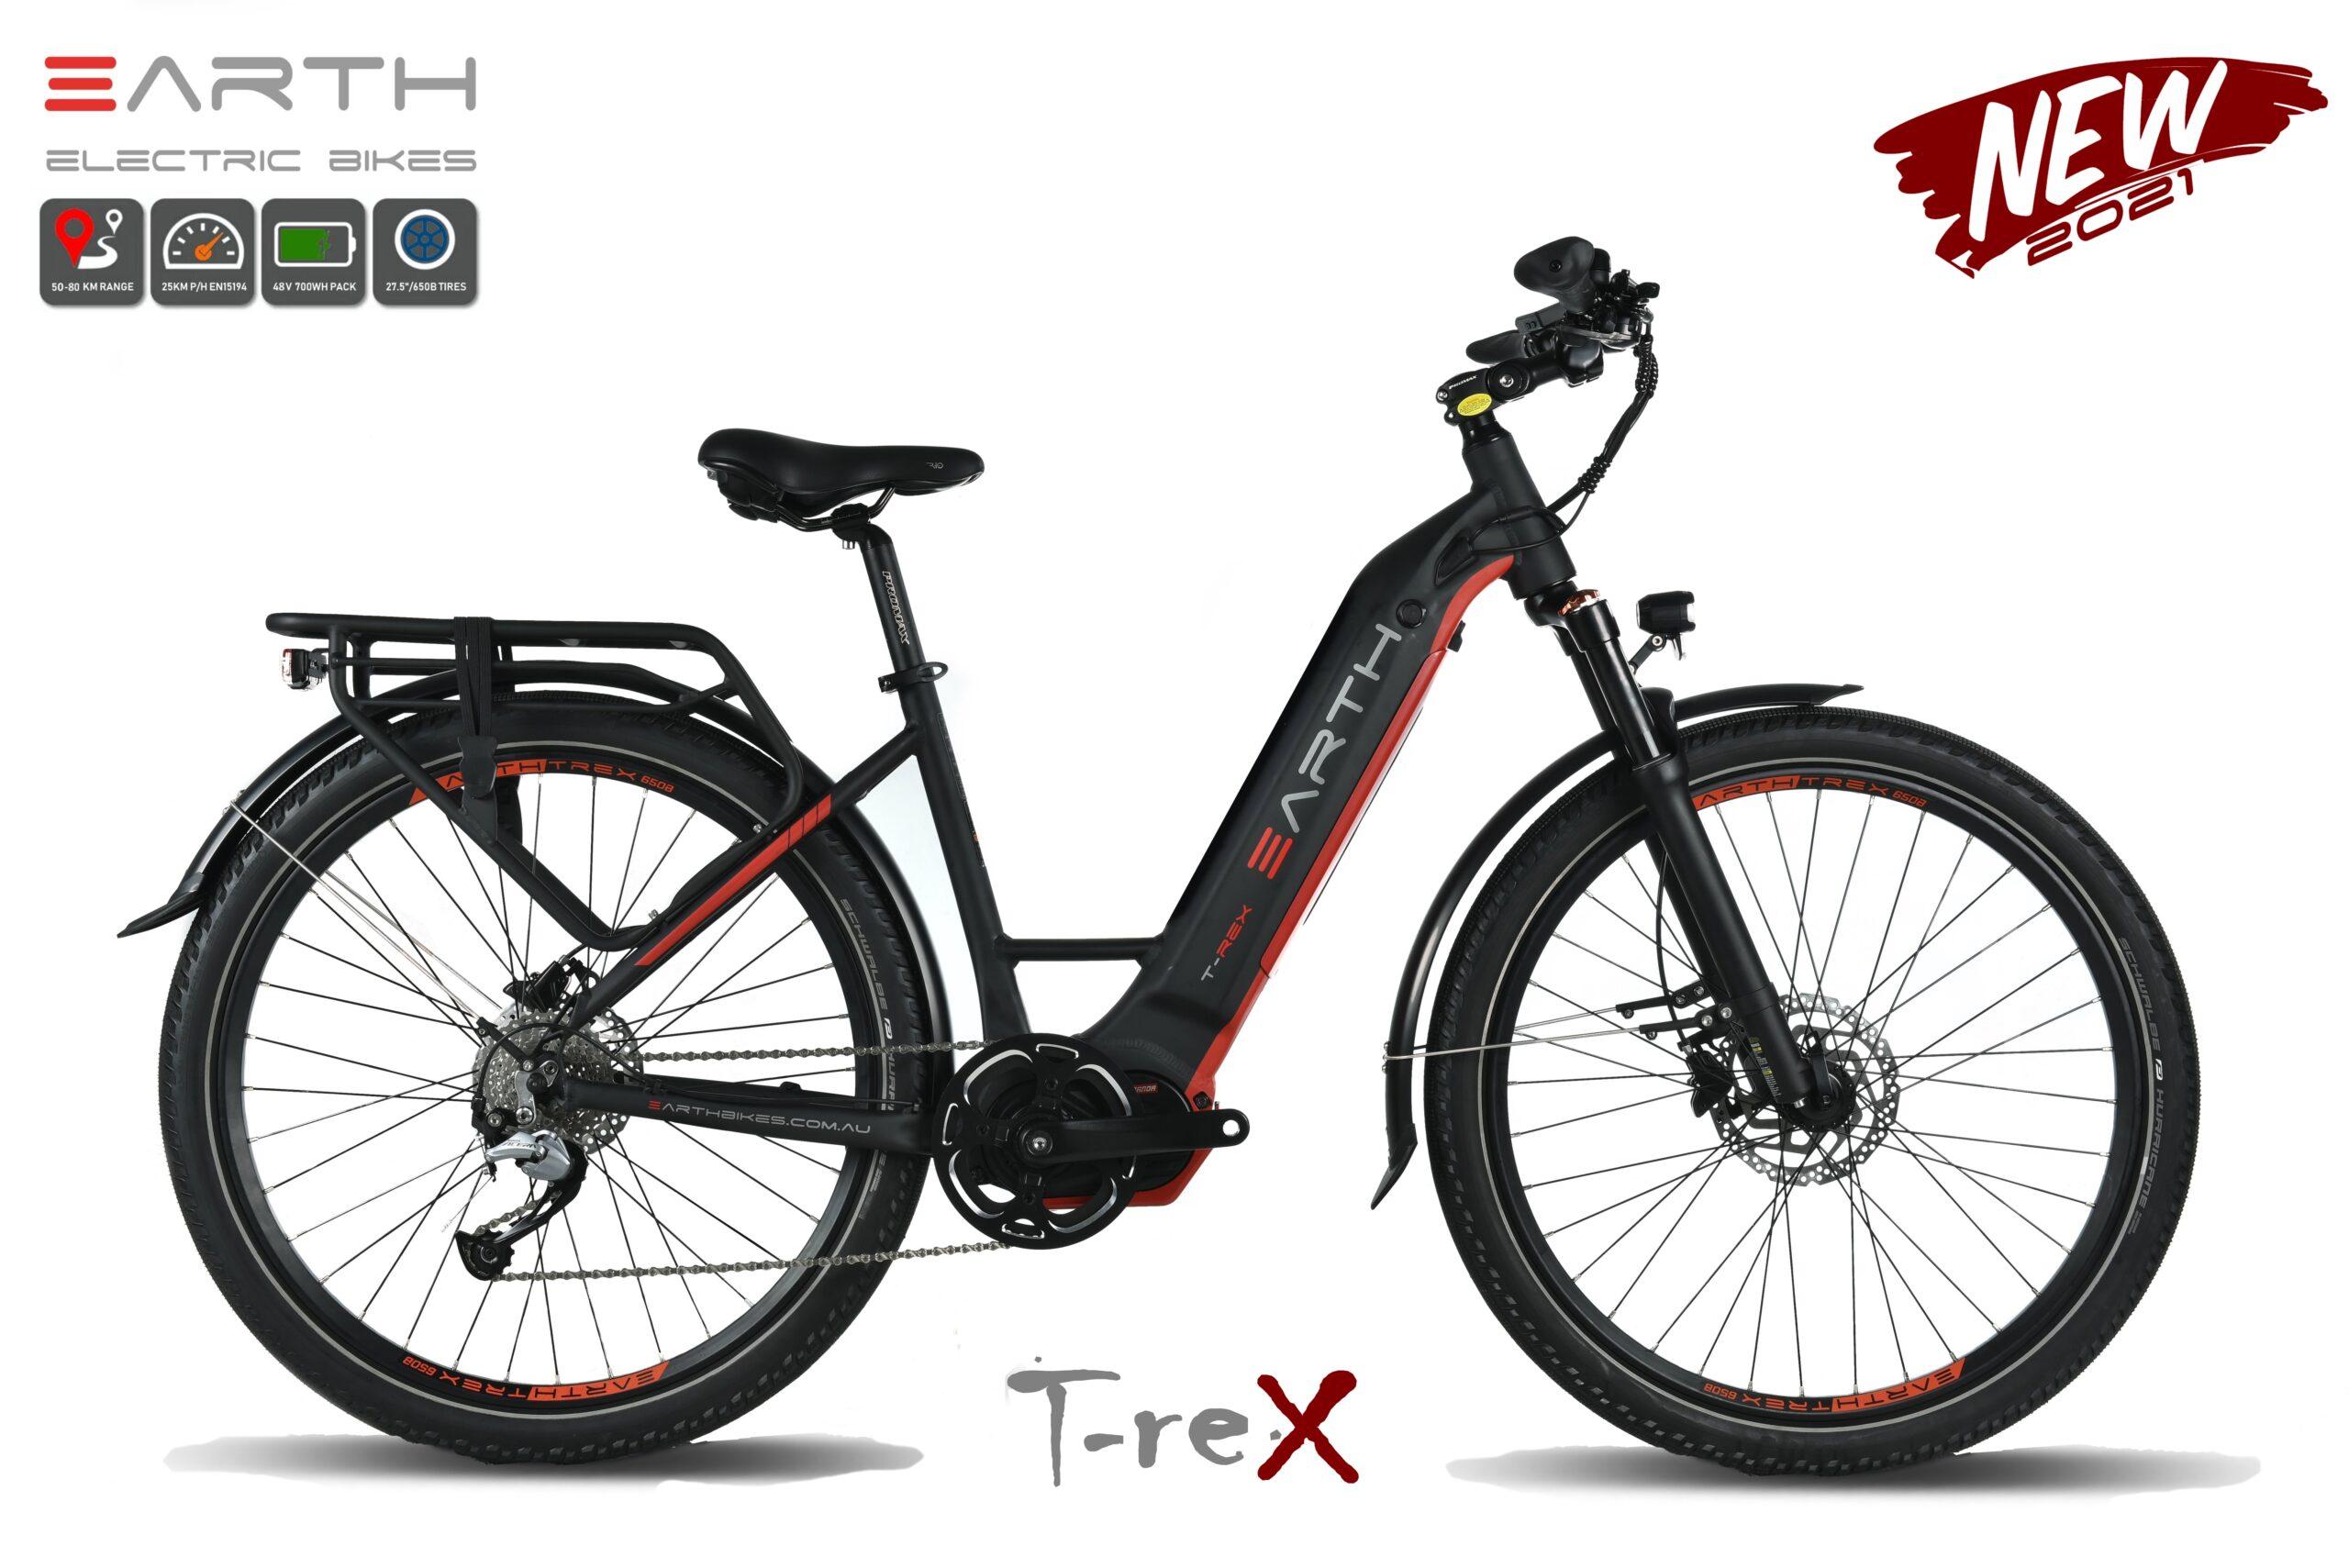 Earth T Rex Mixie Electric Bike 27.5 2021